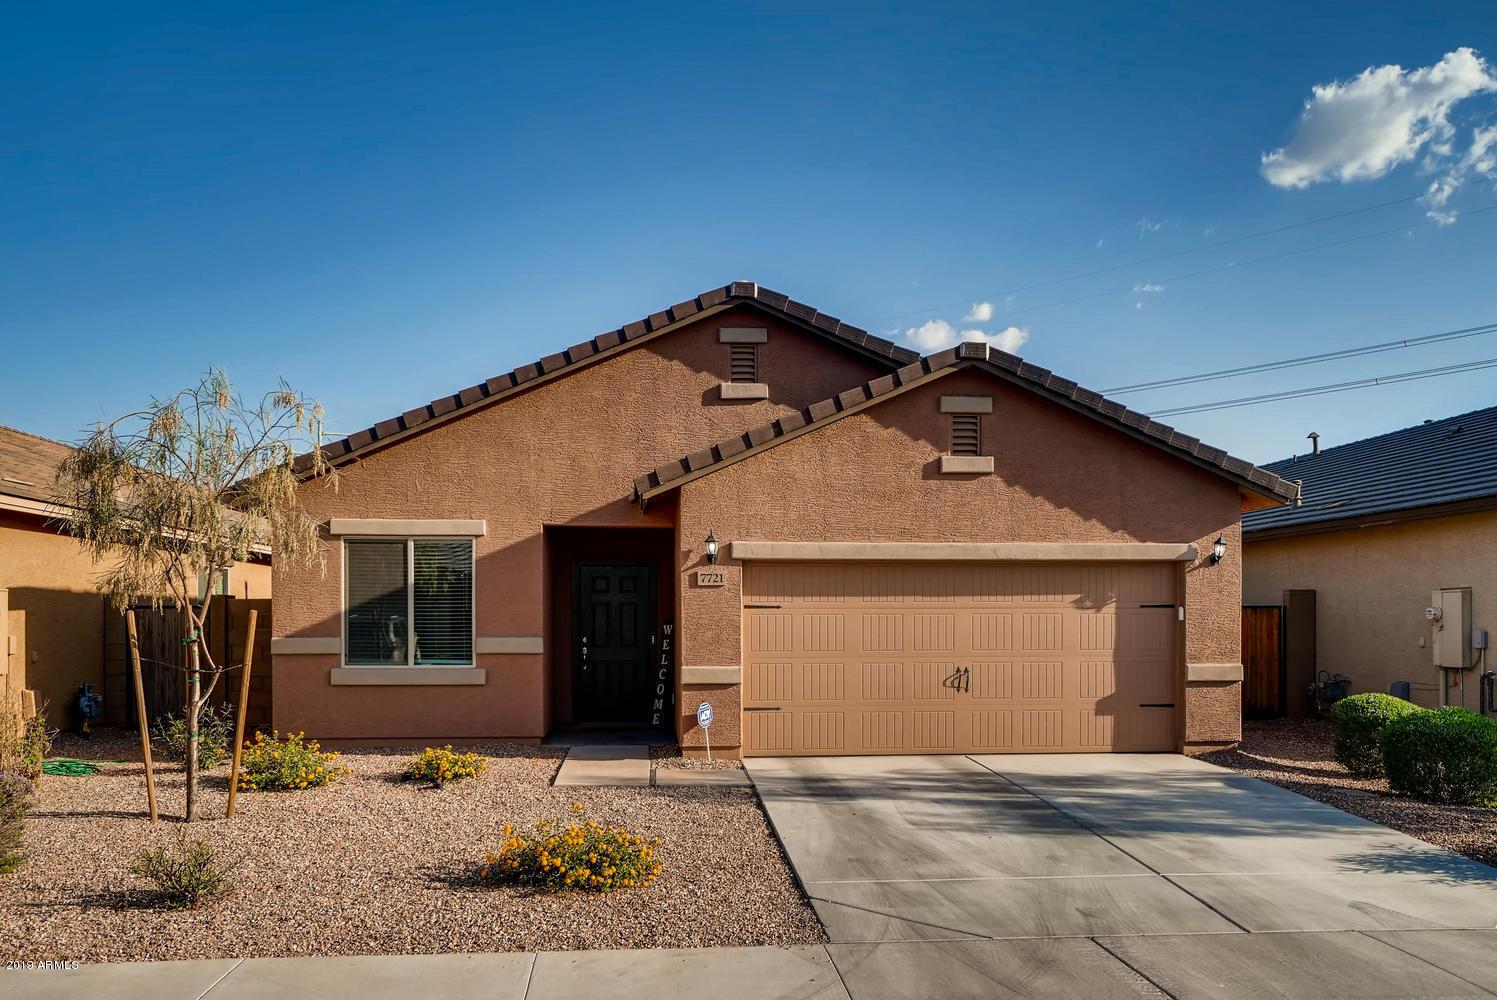 Photo of 7721 W CARTER Road, Laveen, AZ 85339